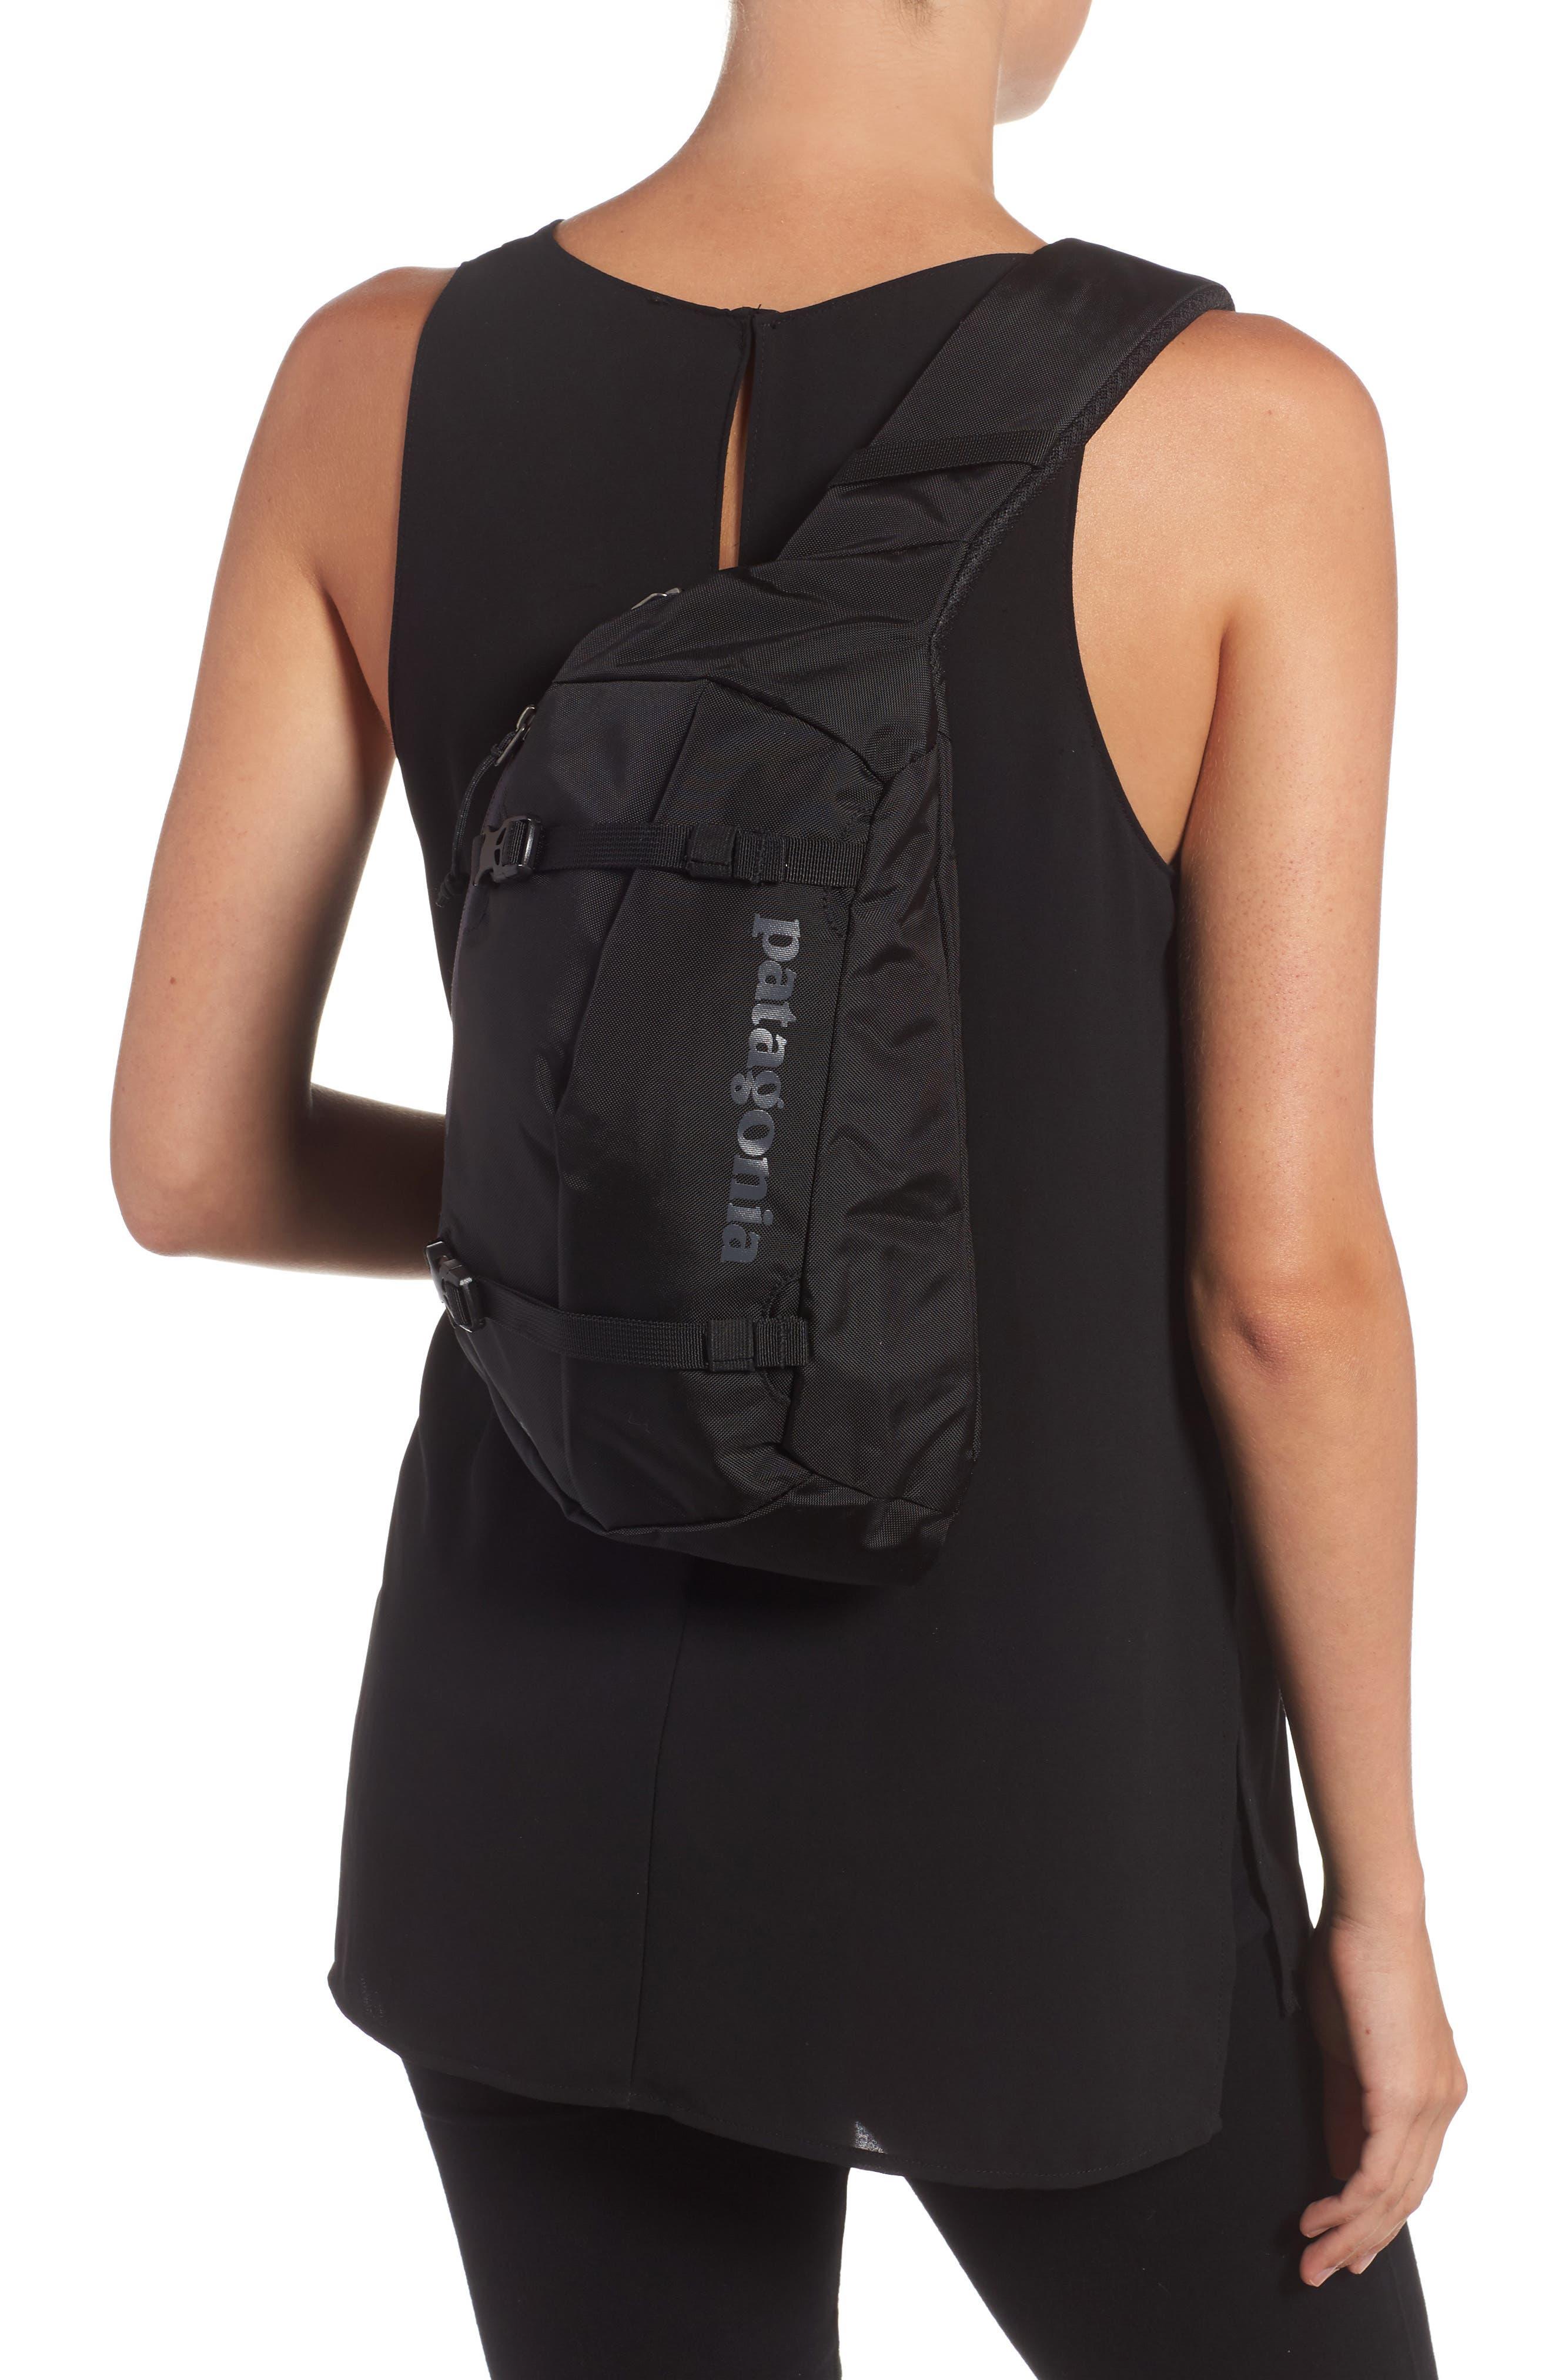 PATAGONIA, Atom 8L Sling Backpack, Alternate thumbnail 2, color, BLACK